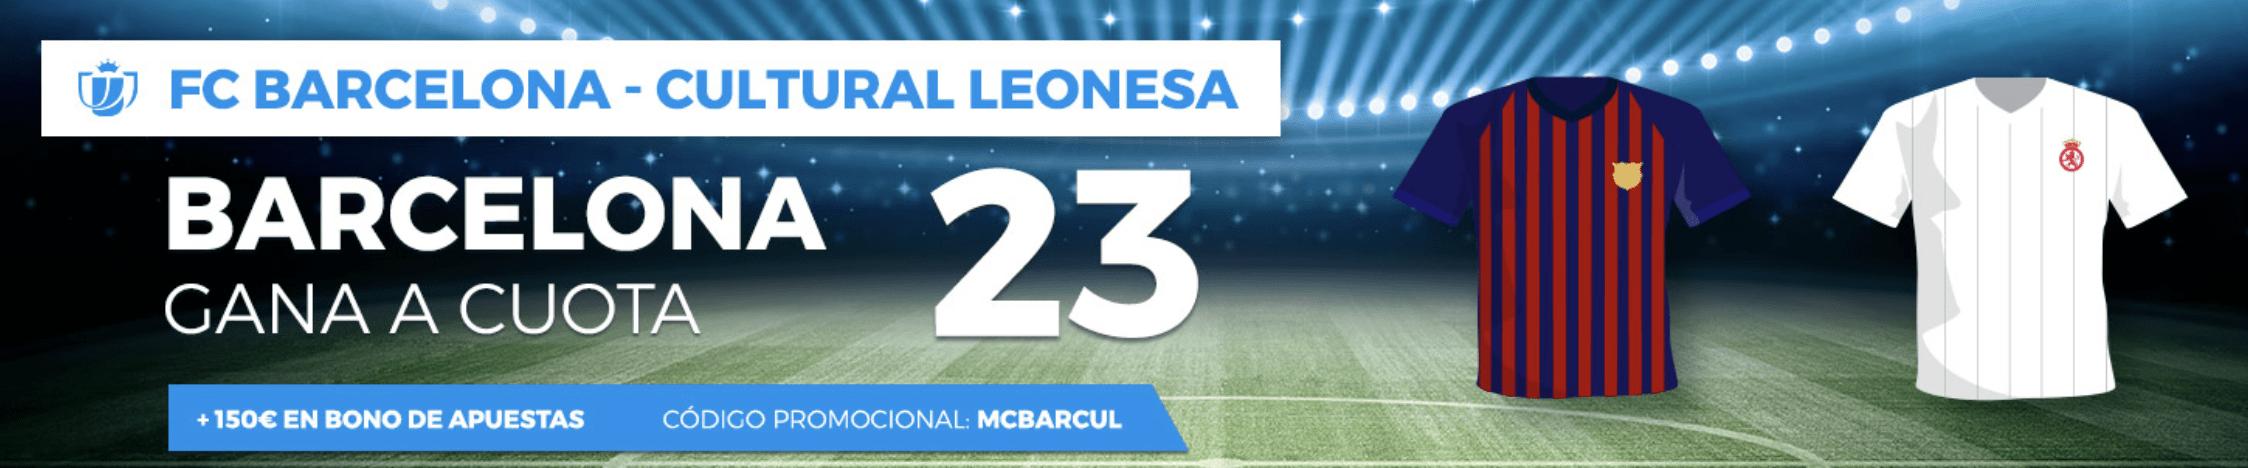 Supercuotas pastón Copa del Rey : FC Barcelona - Cultural Leonesa